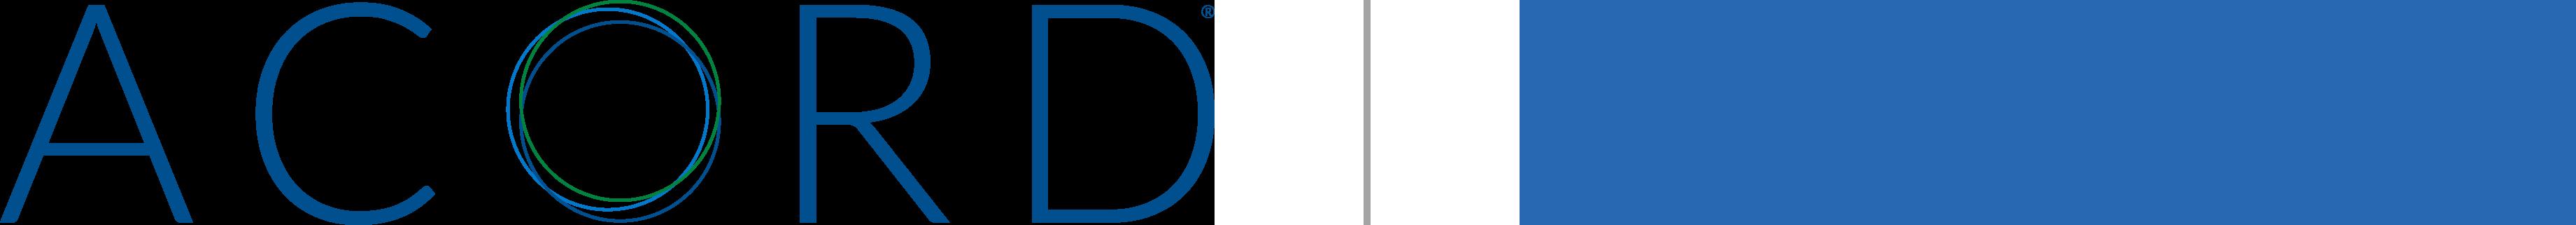 ACORD Corporation logo